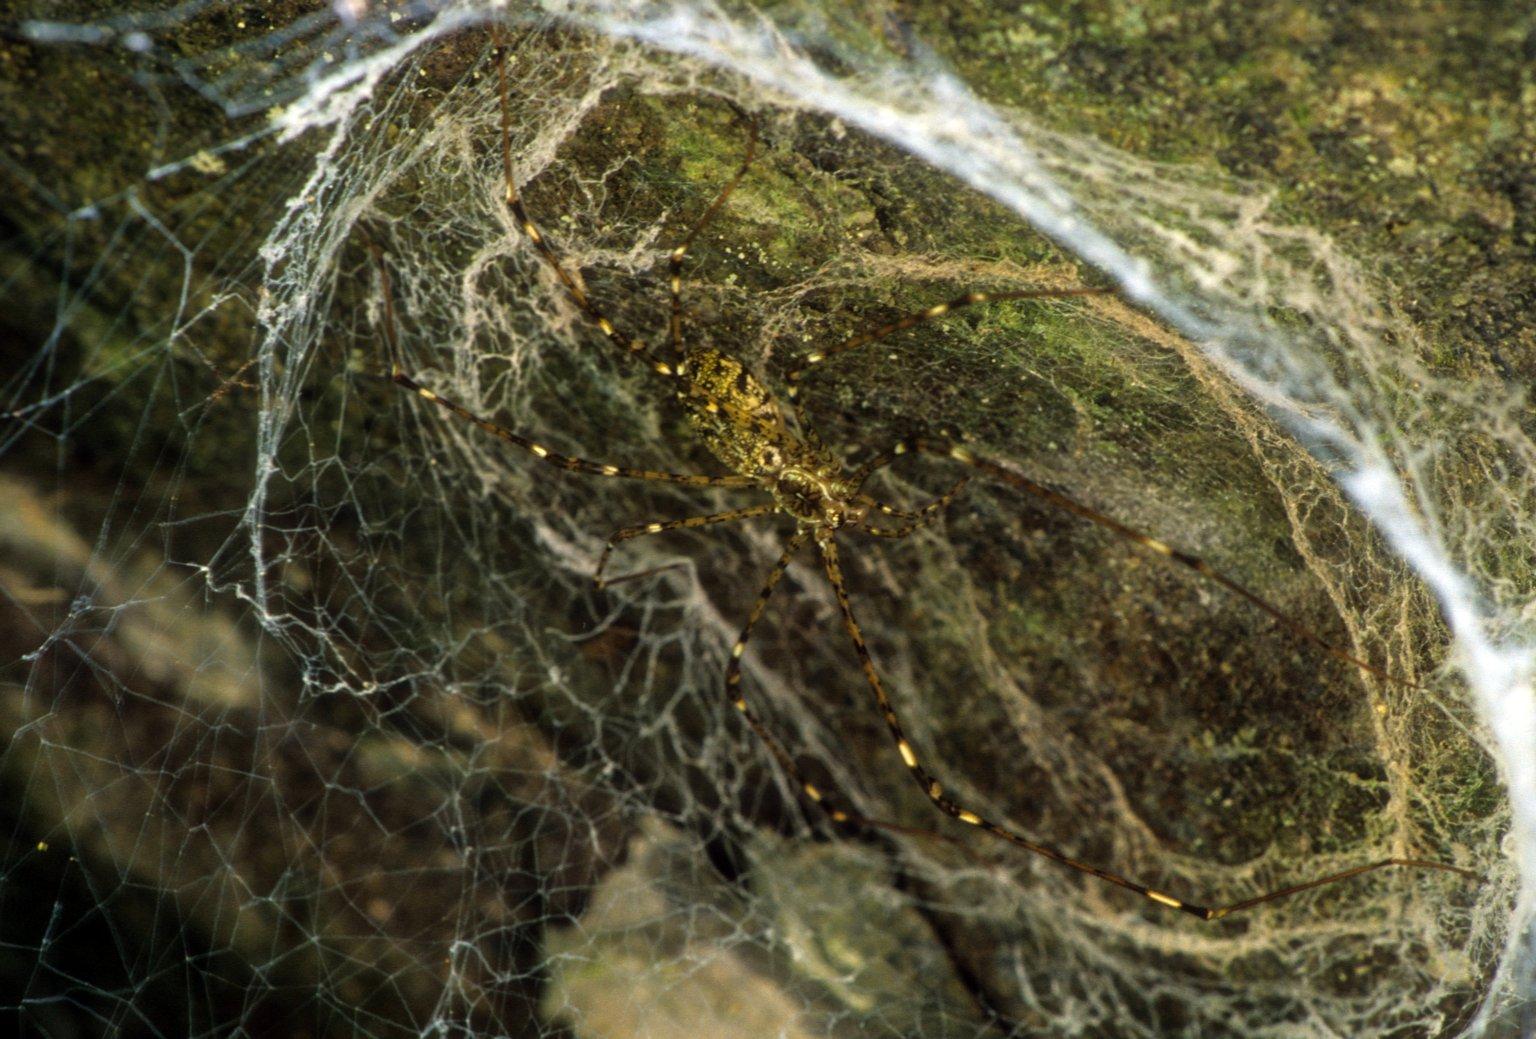 Lampshade spider Hypochilus sp (Hypochilidae)